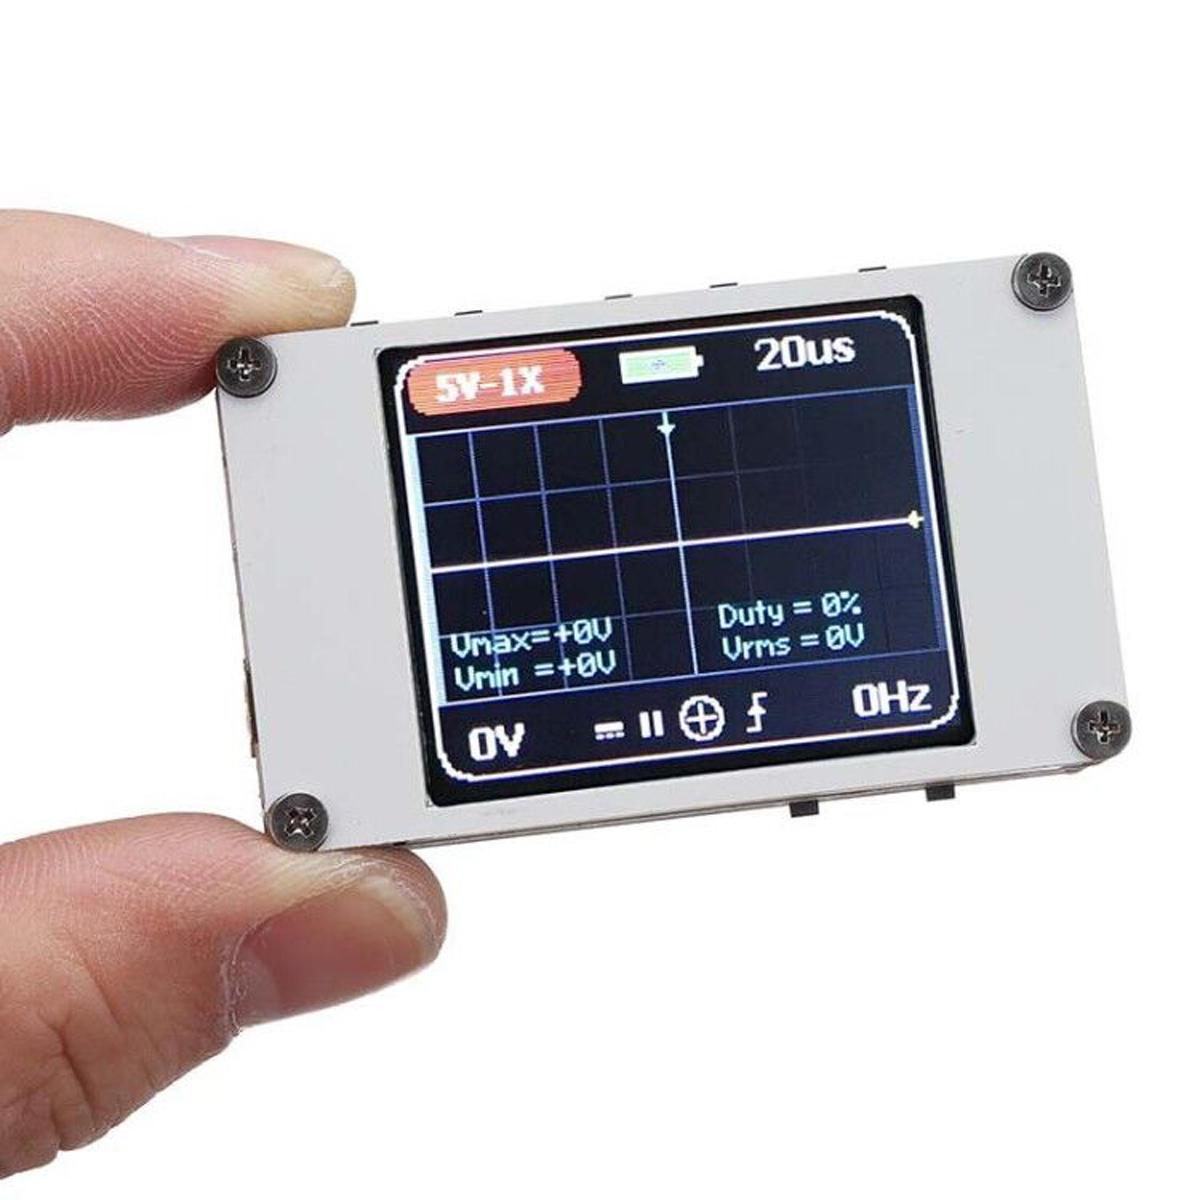 DANIU DSO188 Pocket Digital Ultra-small Oscilloscope 1M Bandwidth 5M Sample Rate Handheld Oscilloscope Kit